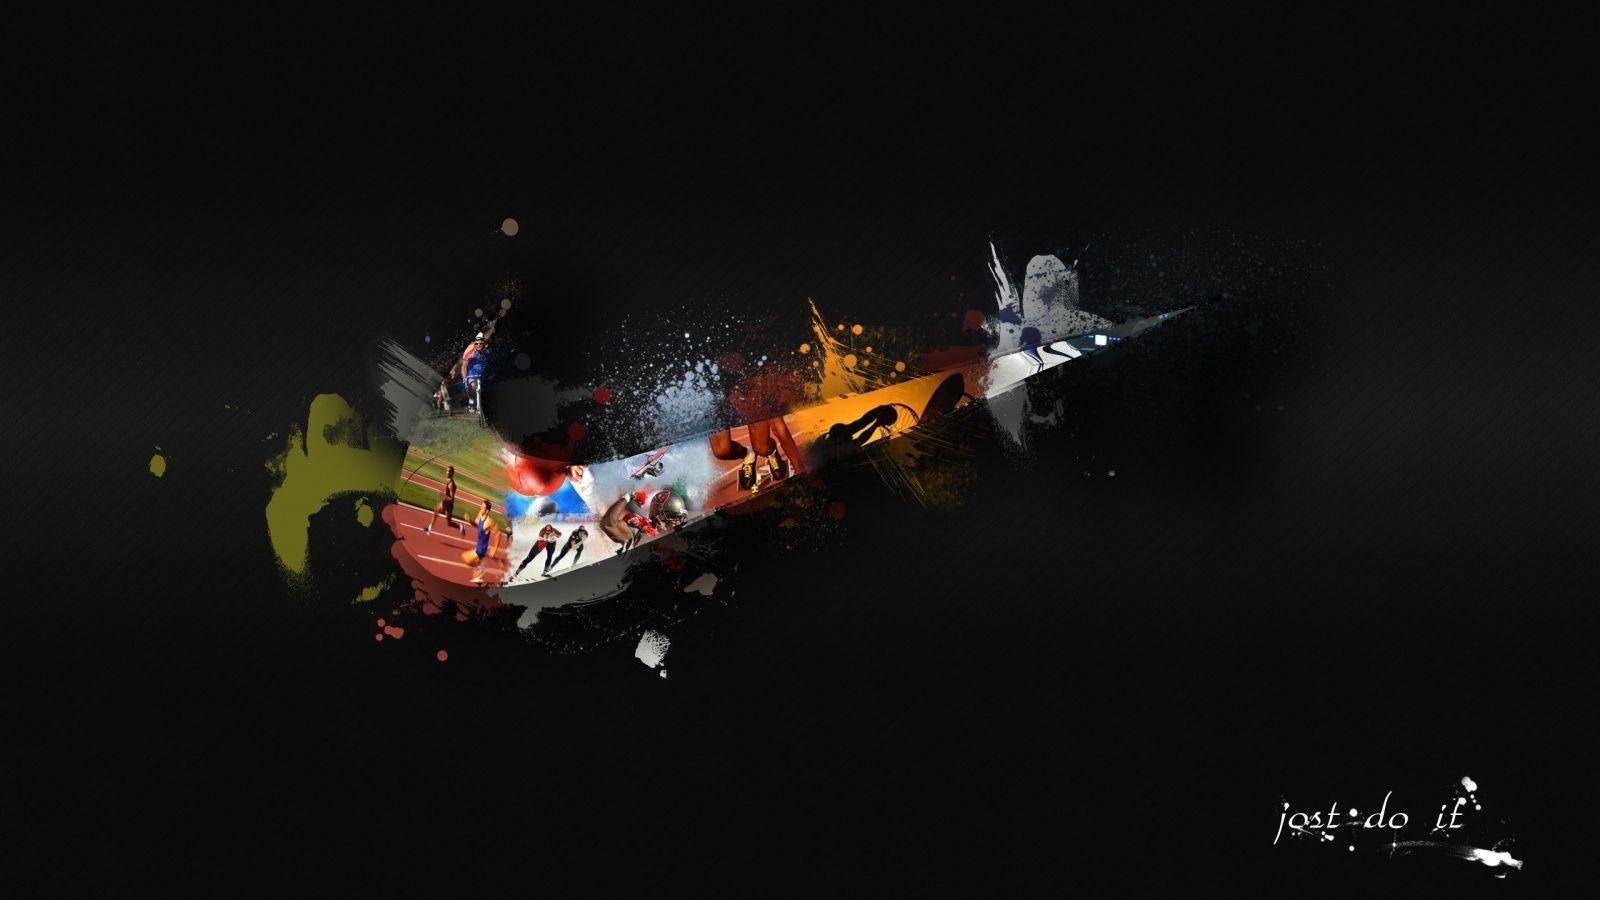 Nike Computer Wallpapers, Desktop Backgrounds 1600x900 Id: 333424